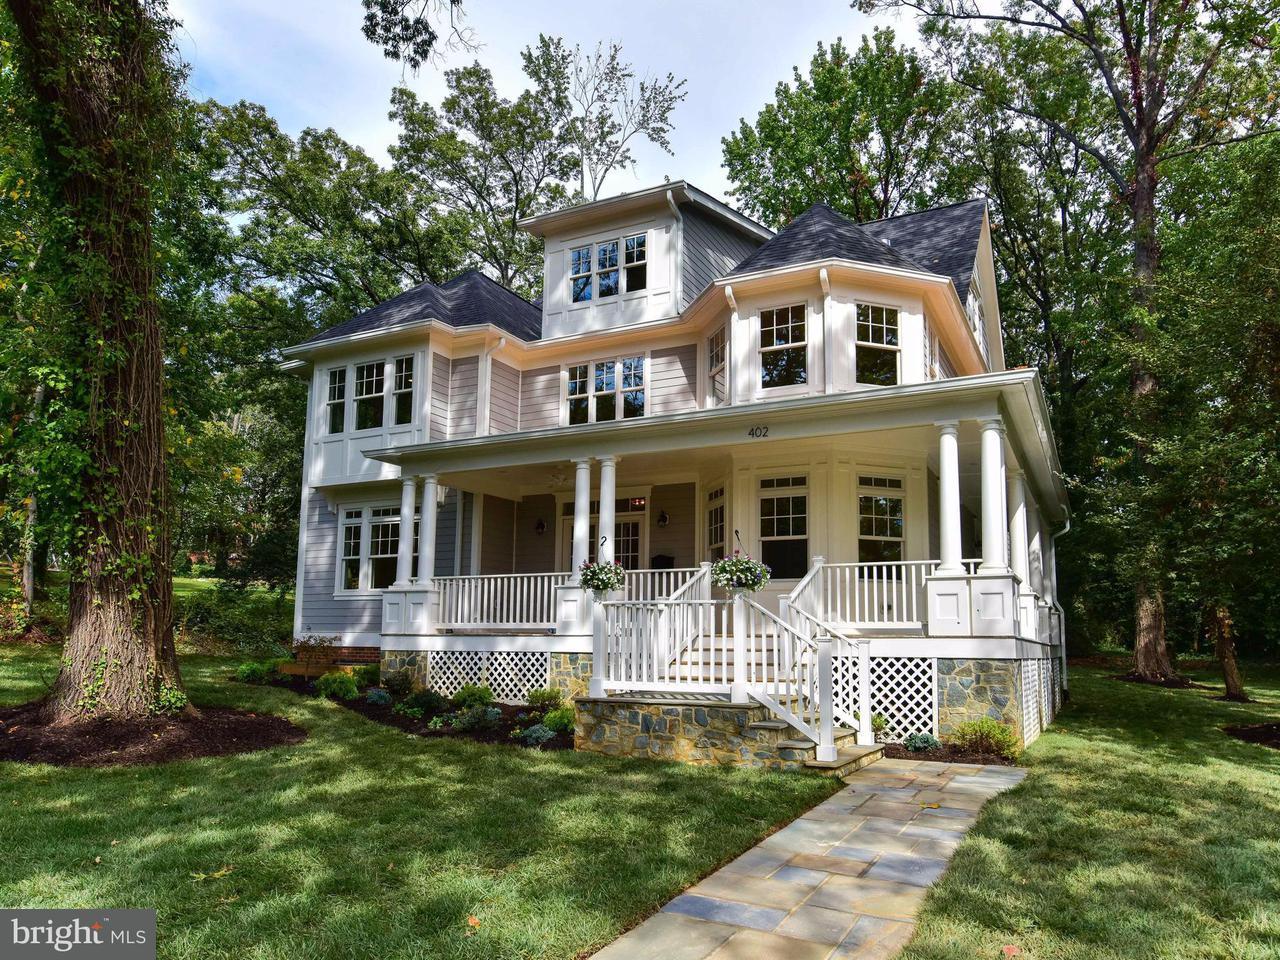 Single Family Home for Sale at 402 Princeton Blvd 402 Princeton Blvd Alexandria, Virginia 22314 United States